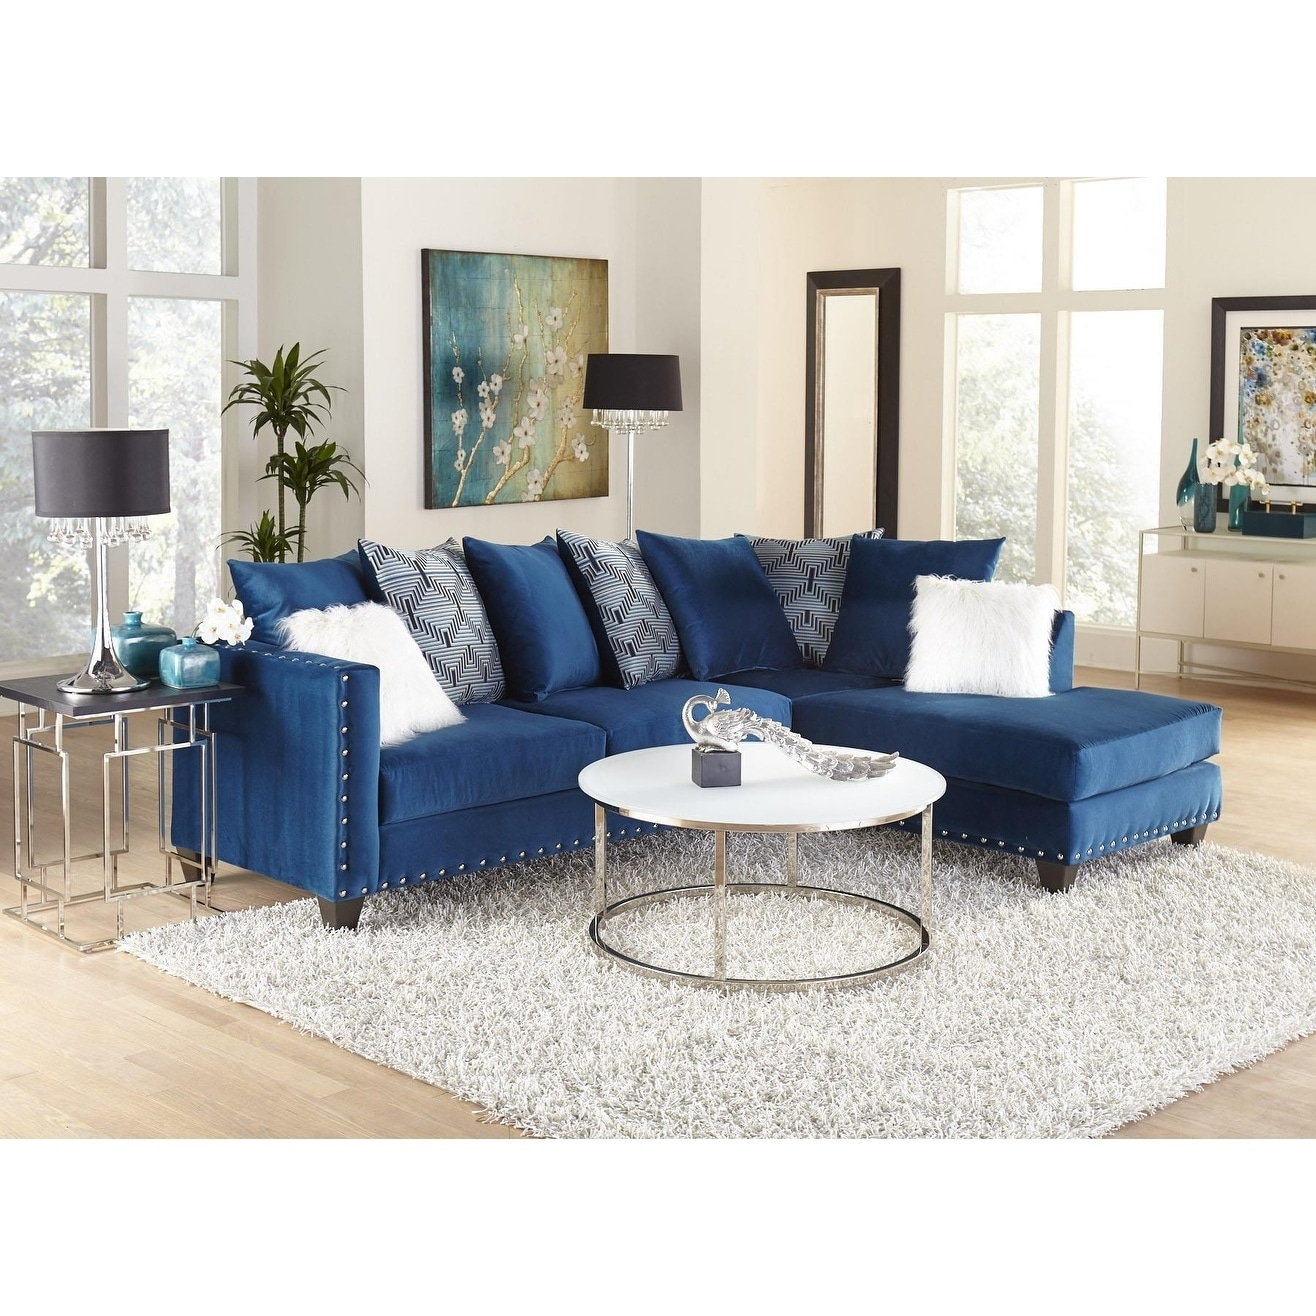 sofatrendz dakota sapphire blue sectional